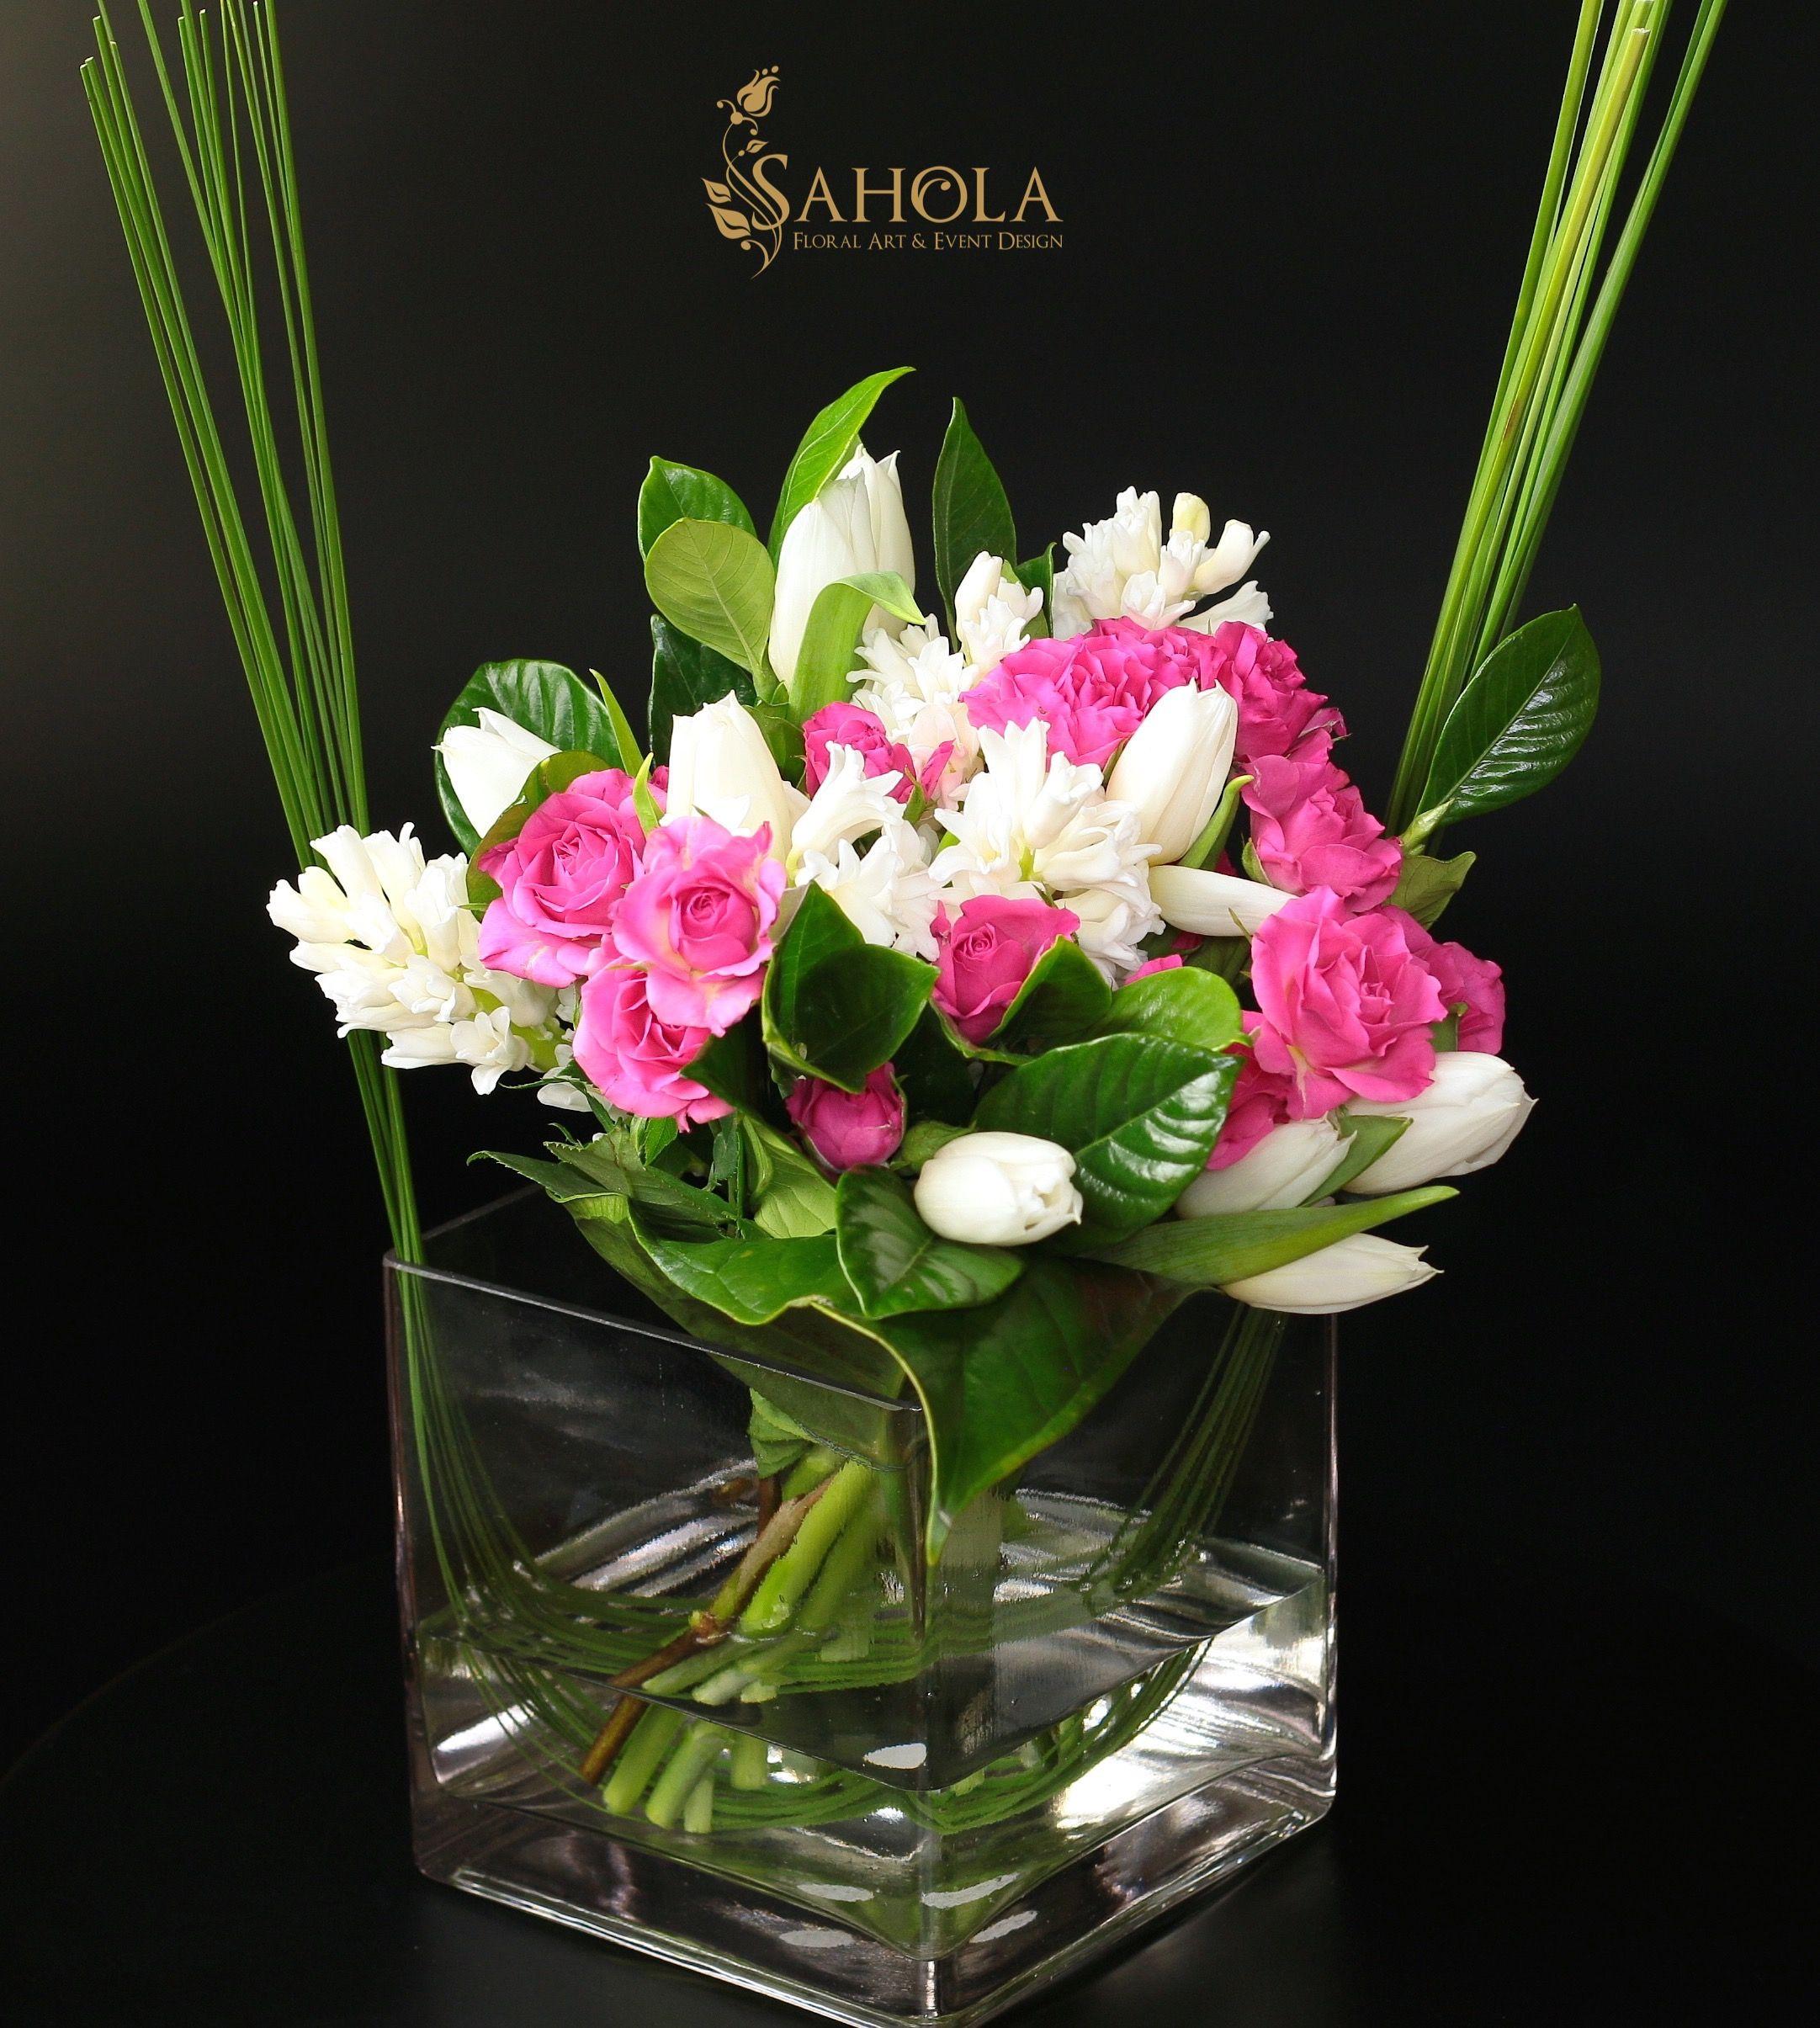 Spring flower arrangement with white tulips pink spray roses spring flower arrangement with white tulips pink spray roses and white hyacinth by saholany izmirmasajfo